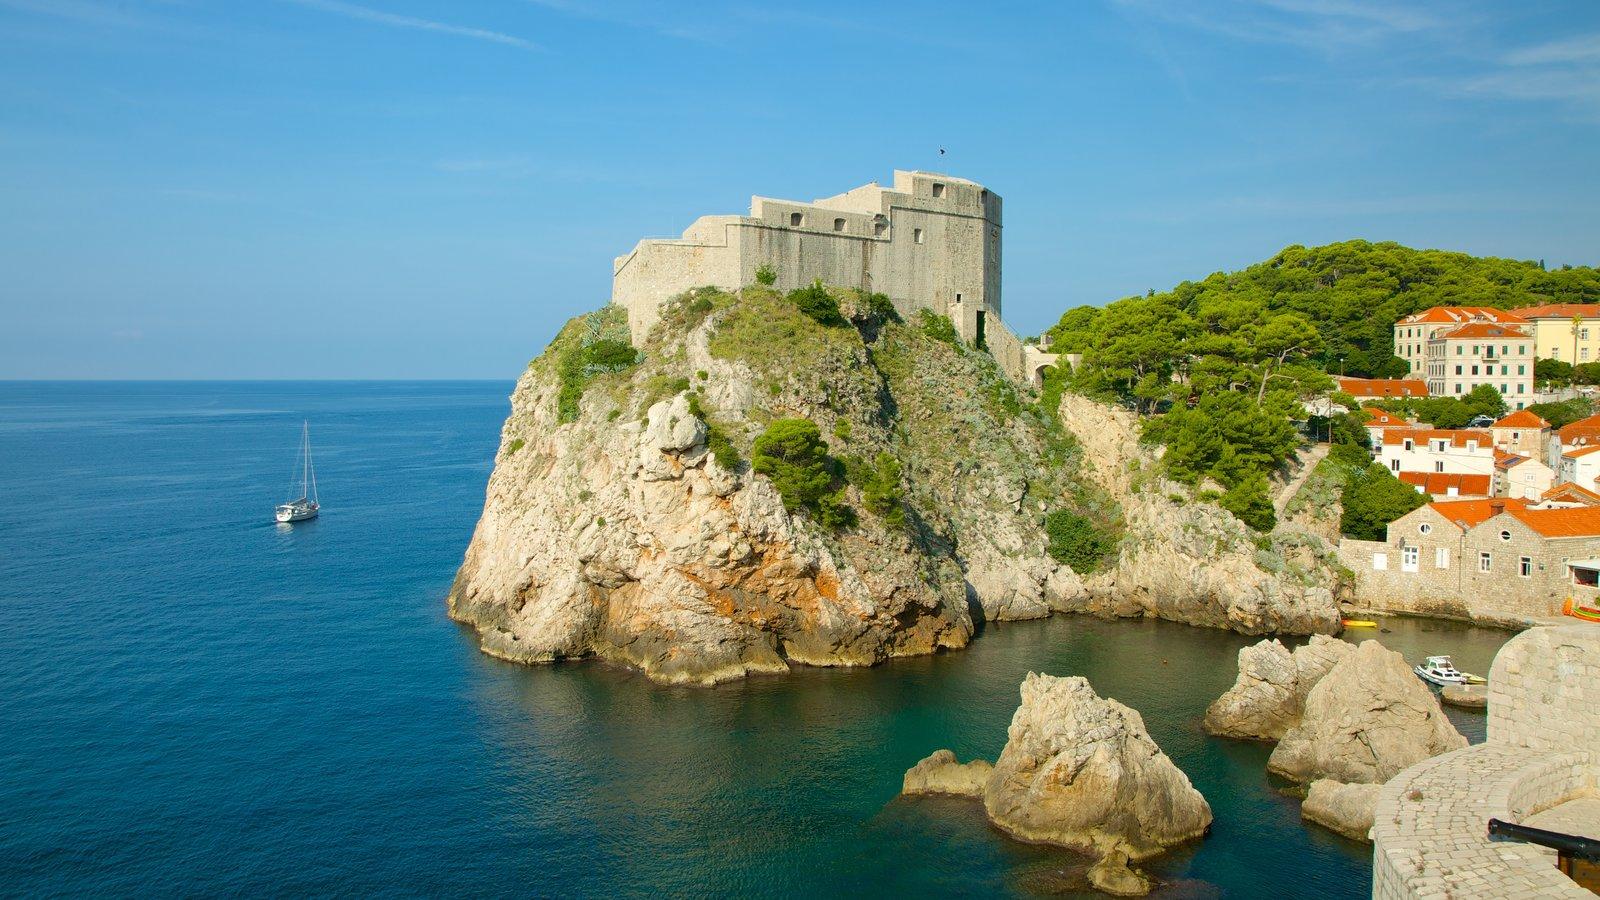 Fortaleza de Lovrijenac mostrando paisagens litorâneas e elementos de patrimônio